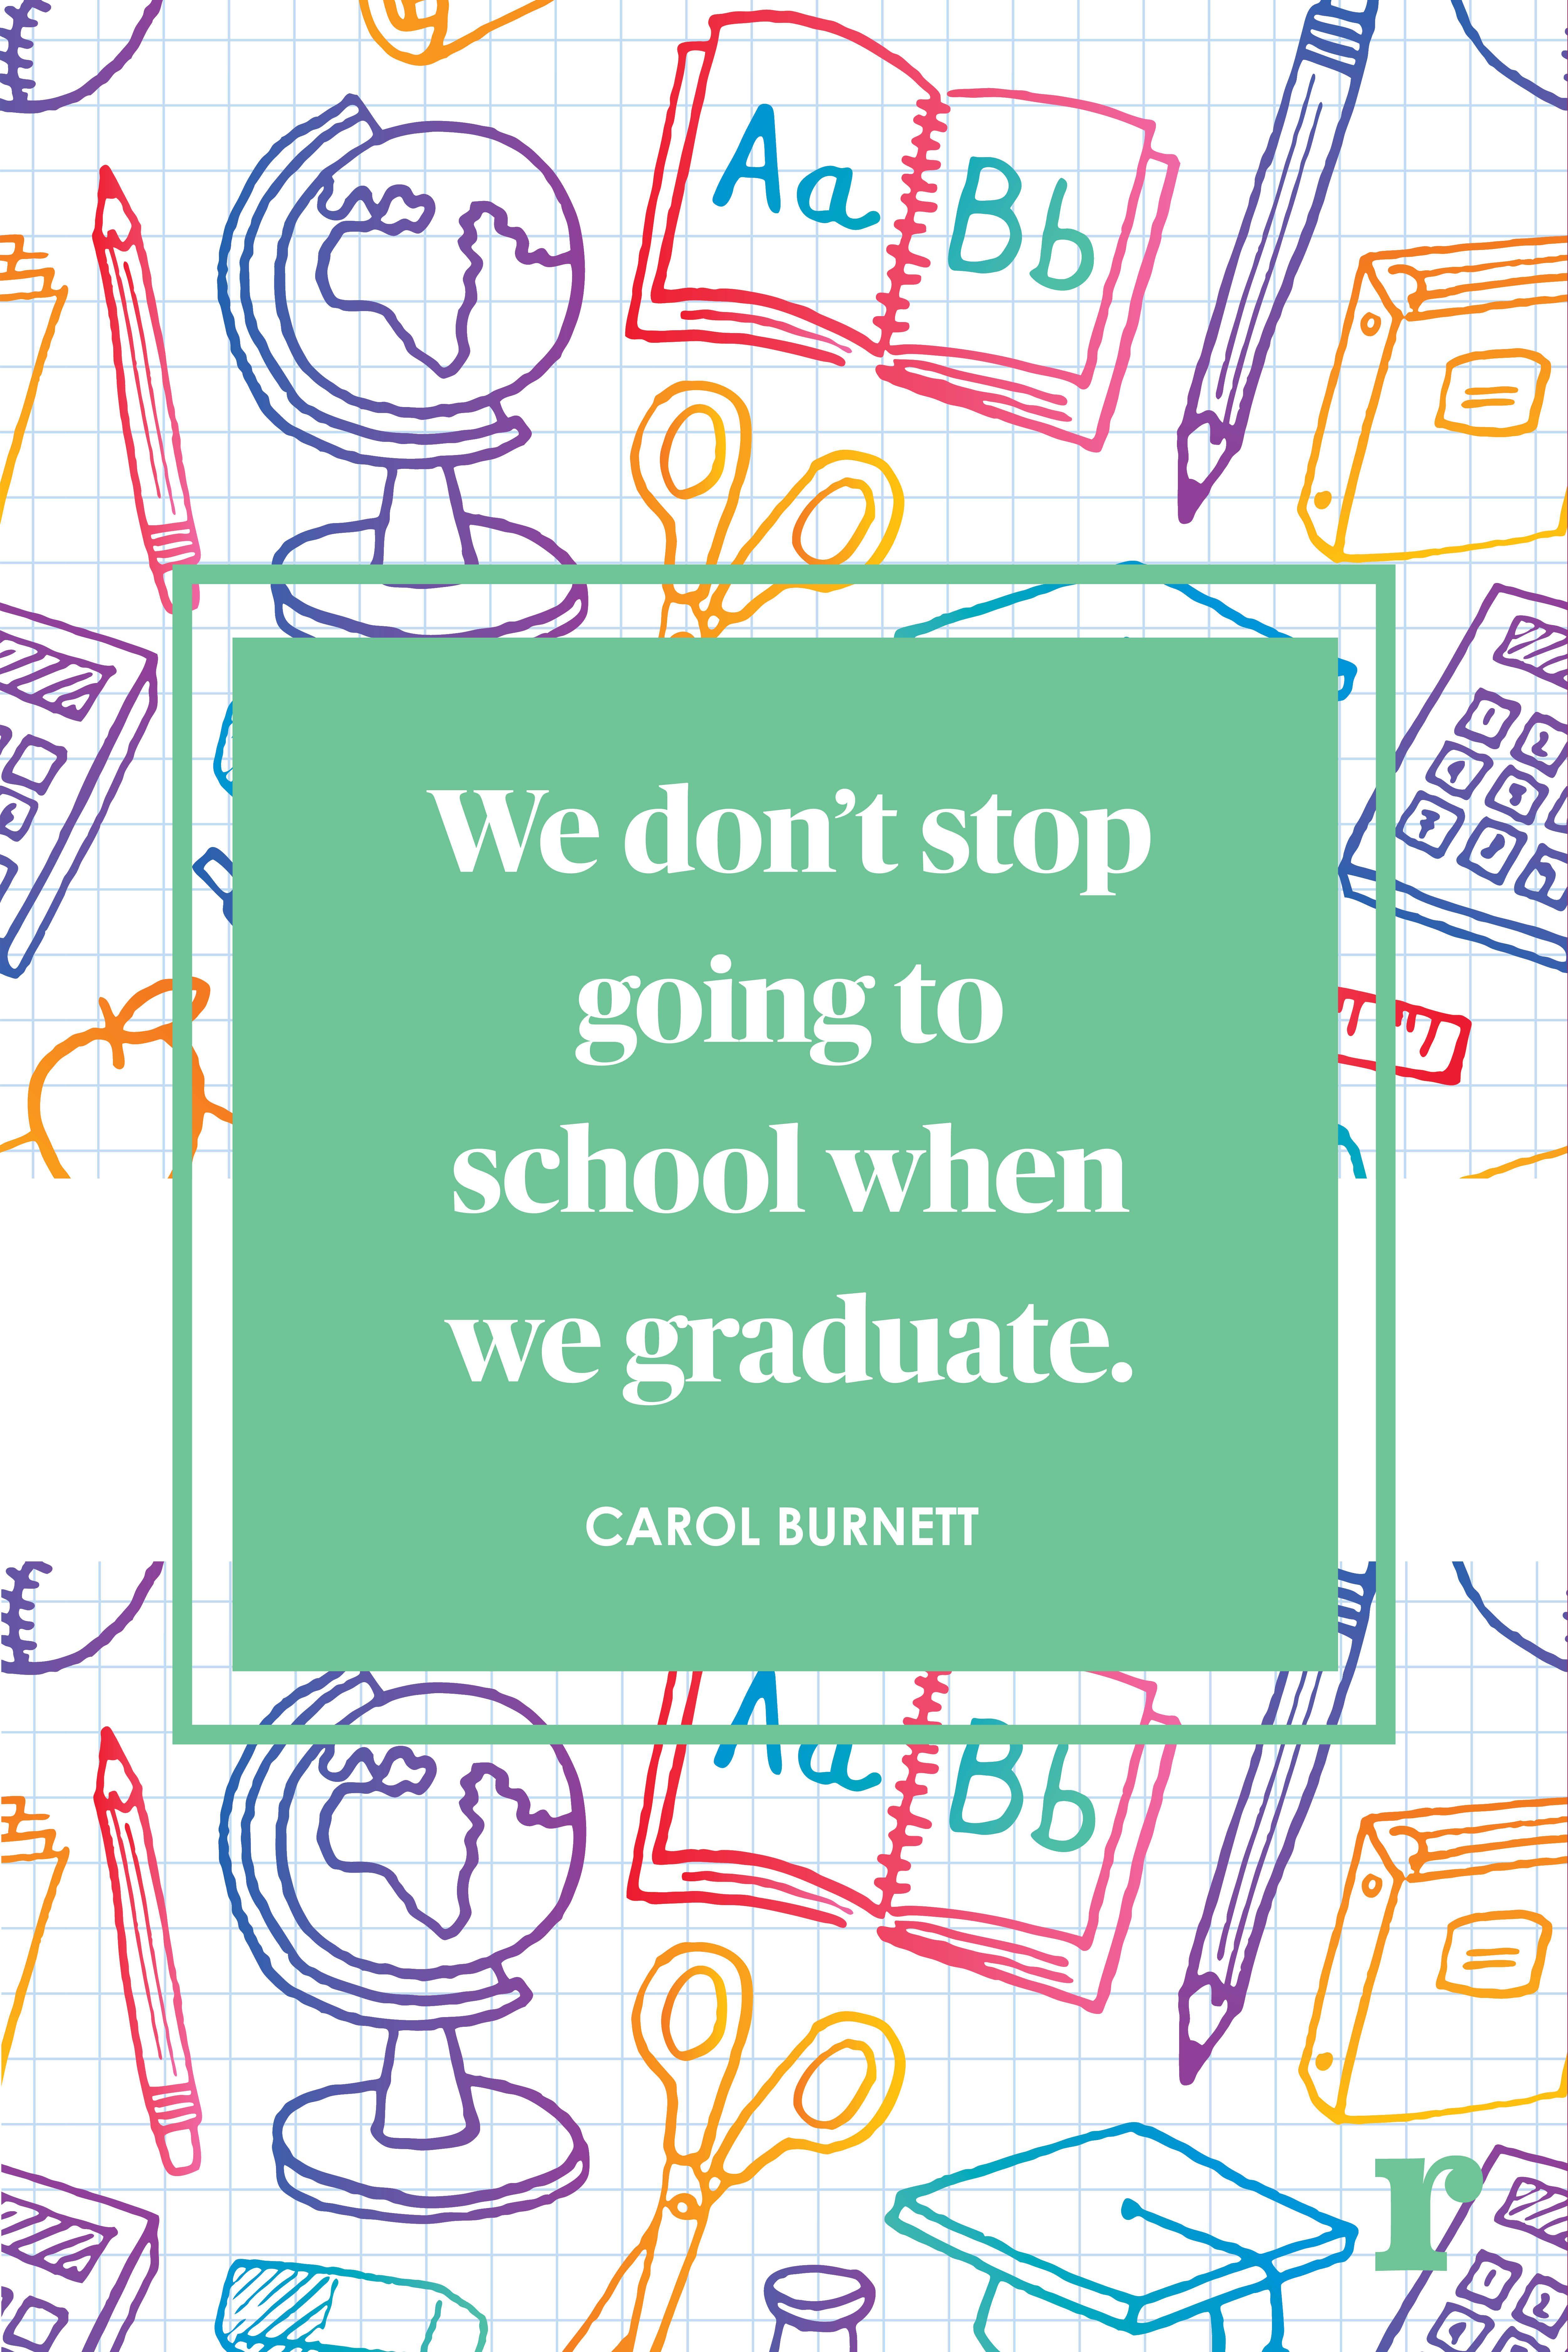 School Quotes 16 Best School Quotes   Inspirational School Quotes School Quotes